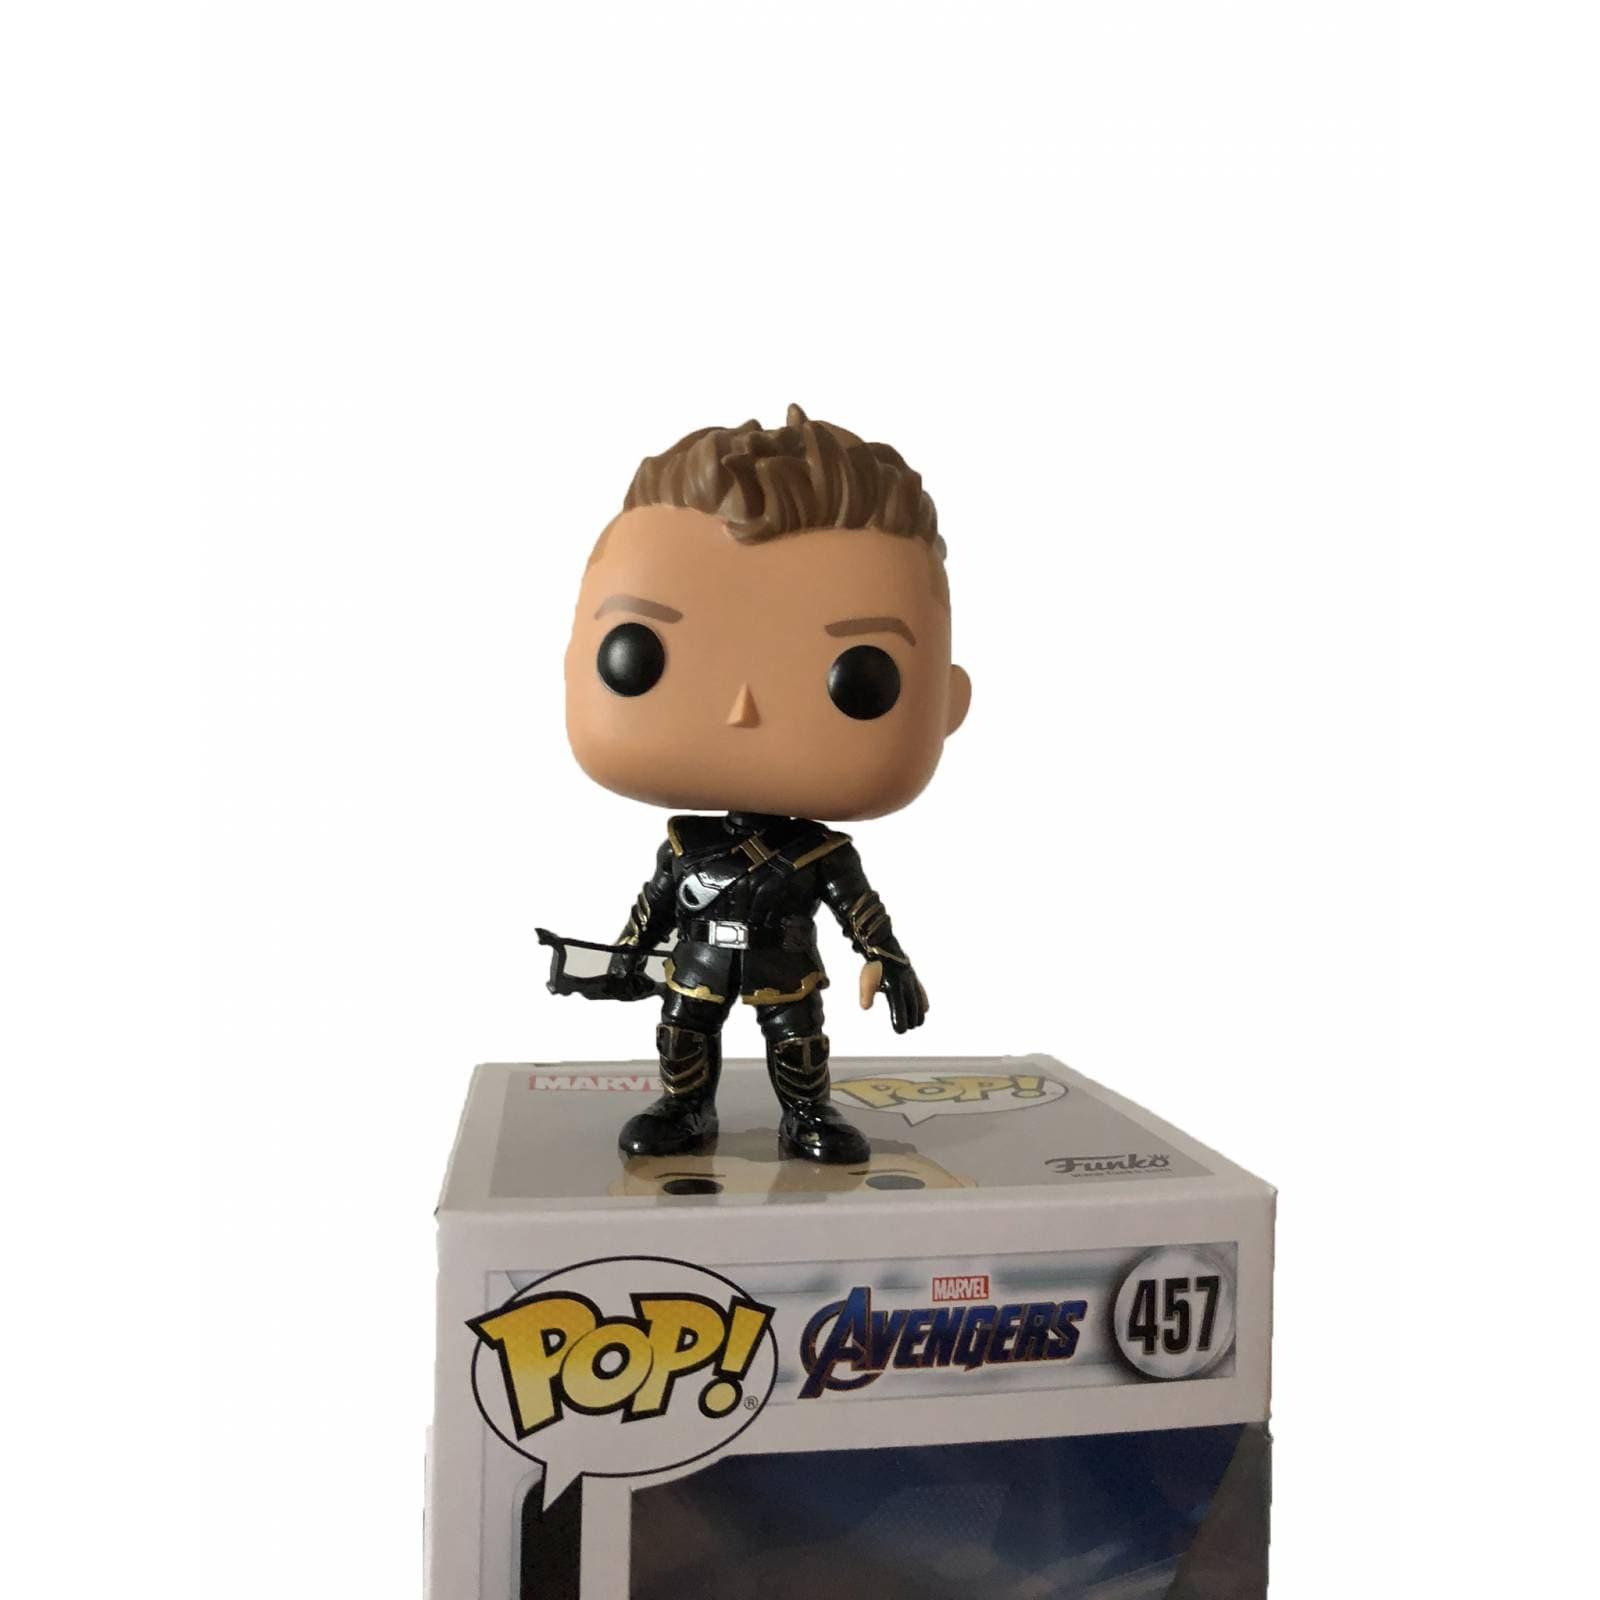 Funko Pop Marvel: Avengers Endgame - Hawkeye con traje Ronin